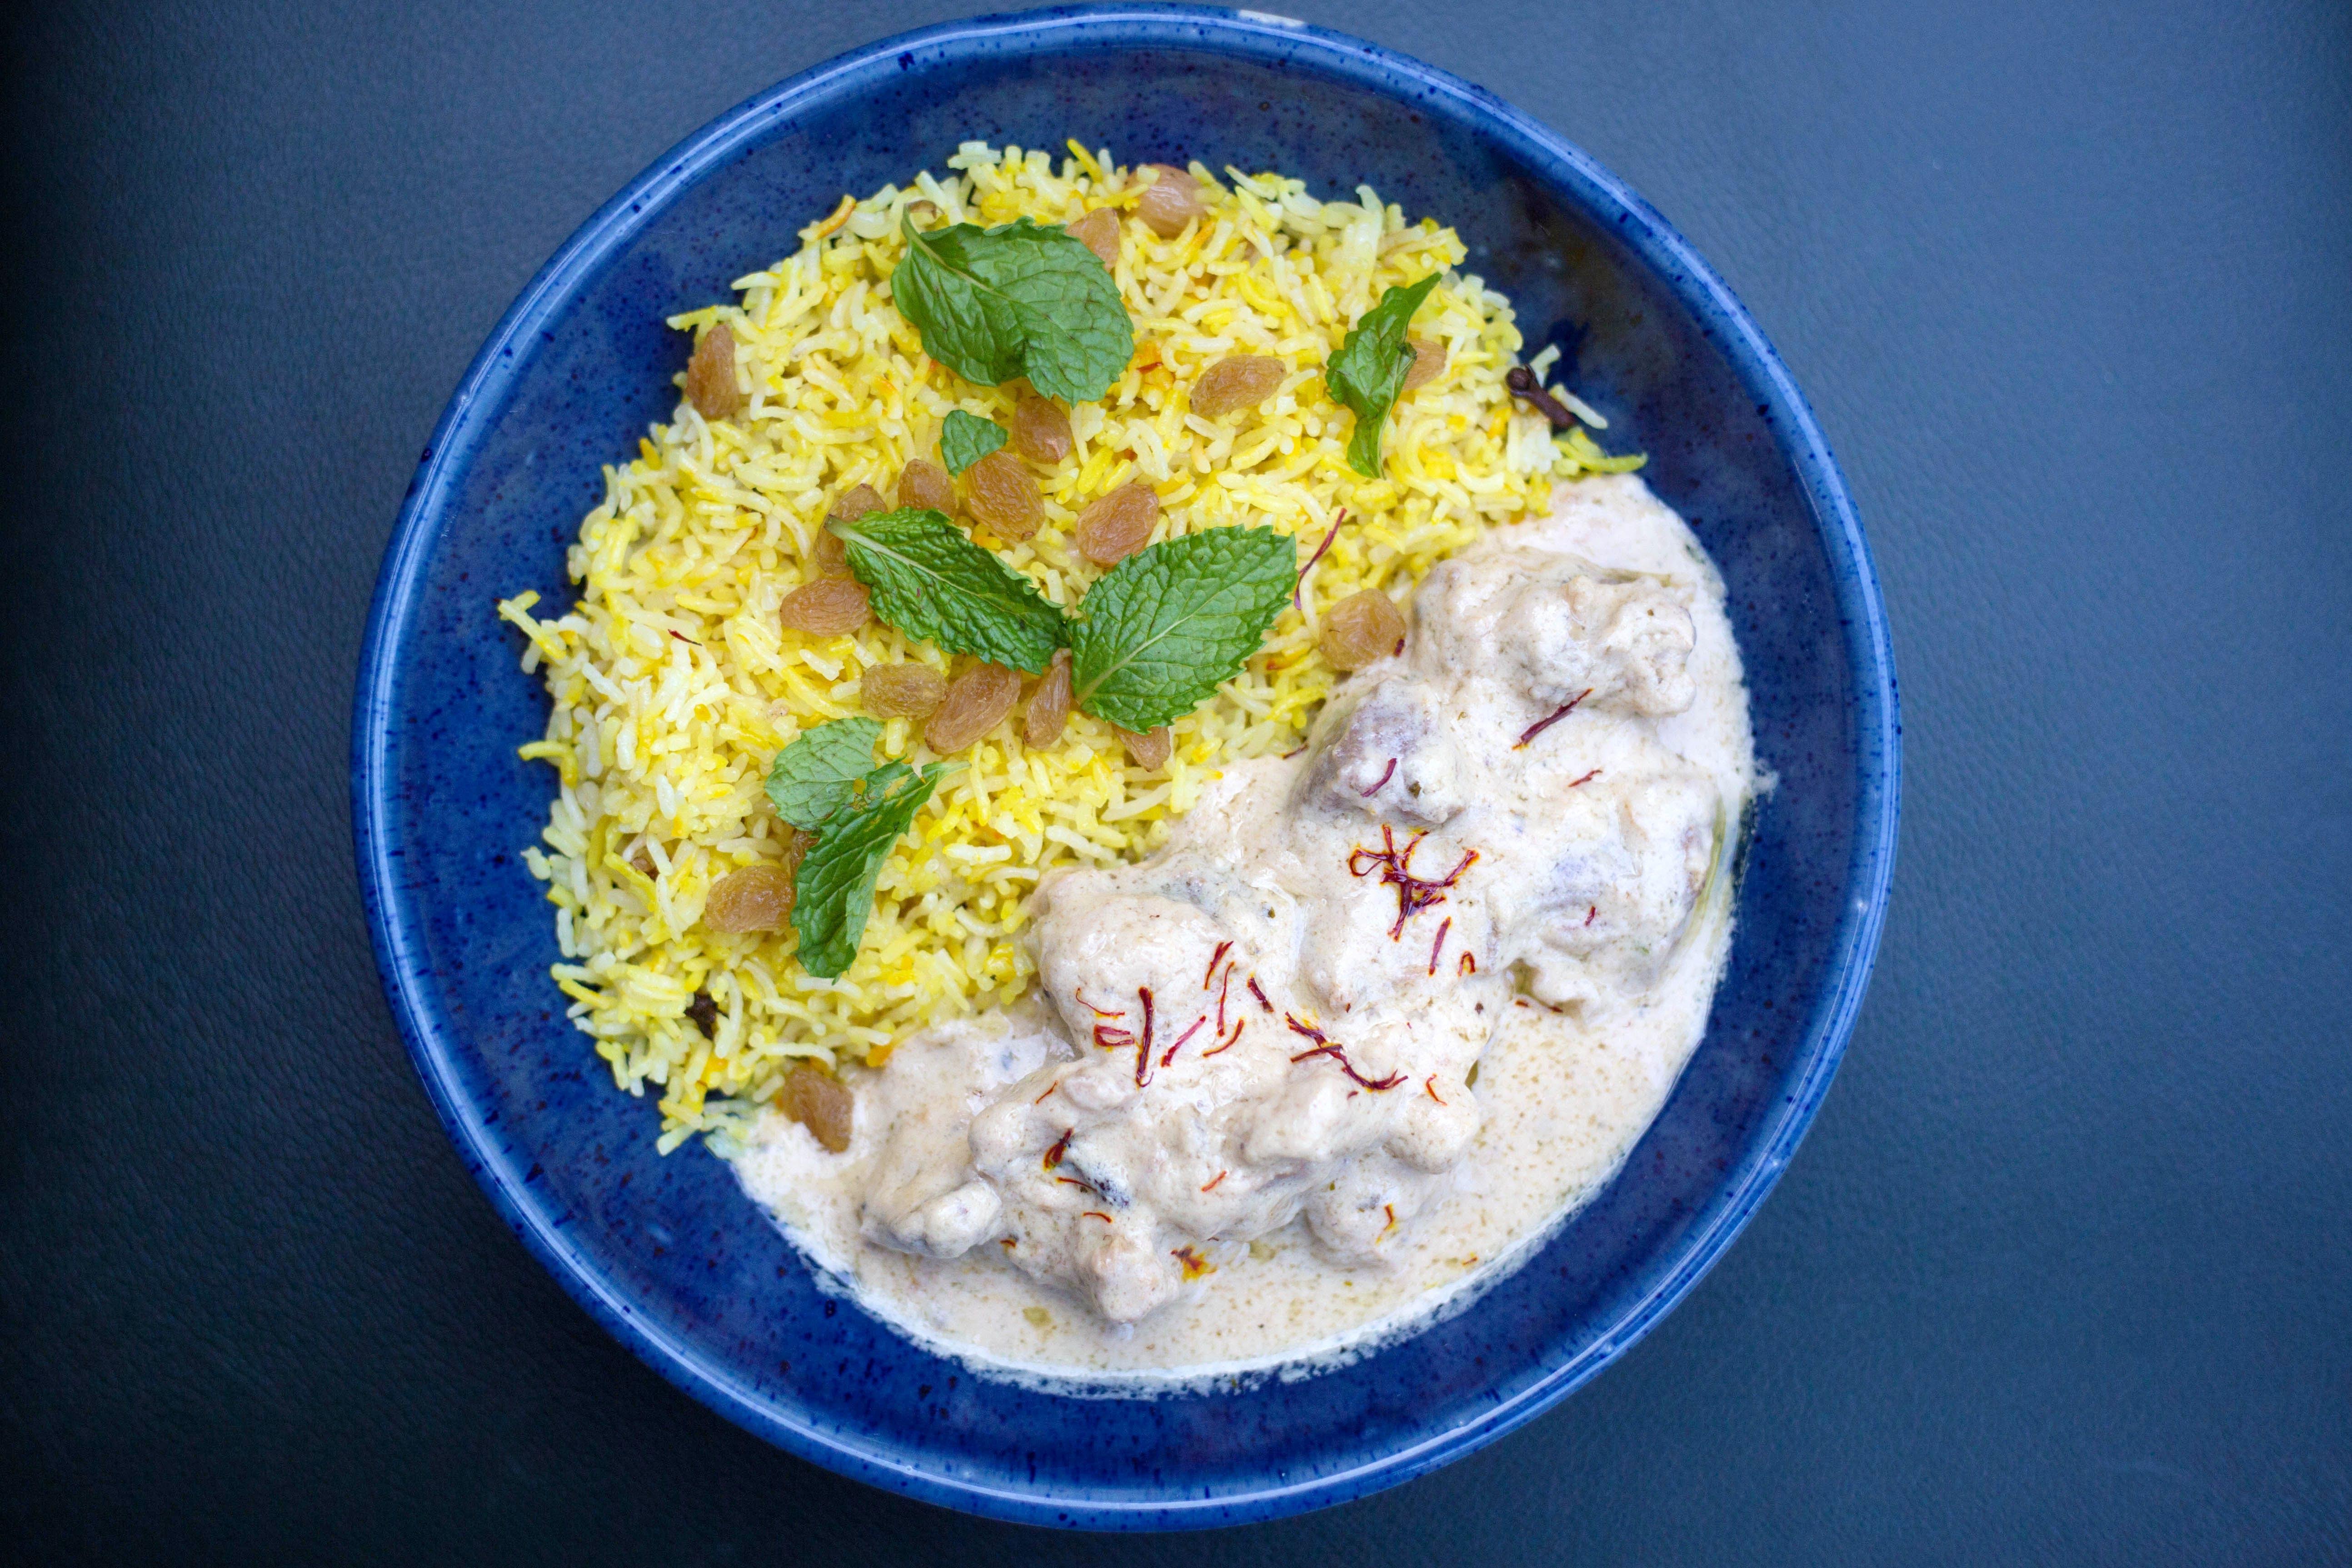 Dish,Cuisine,Food,Ingredient,Indian cuisine,Produce,Recipe,Side dish,Rice,Chitranna